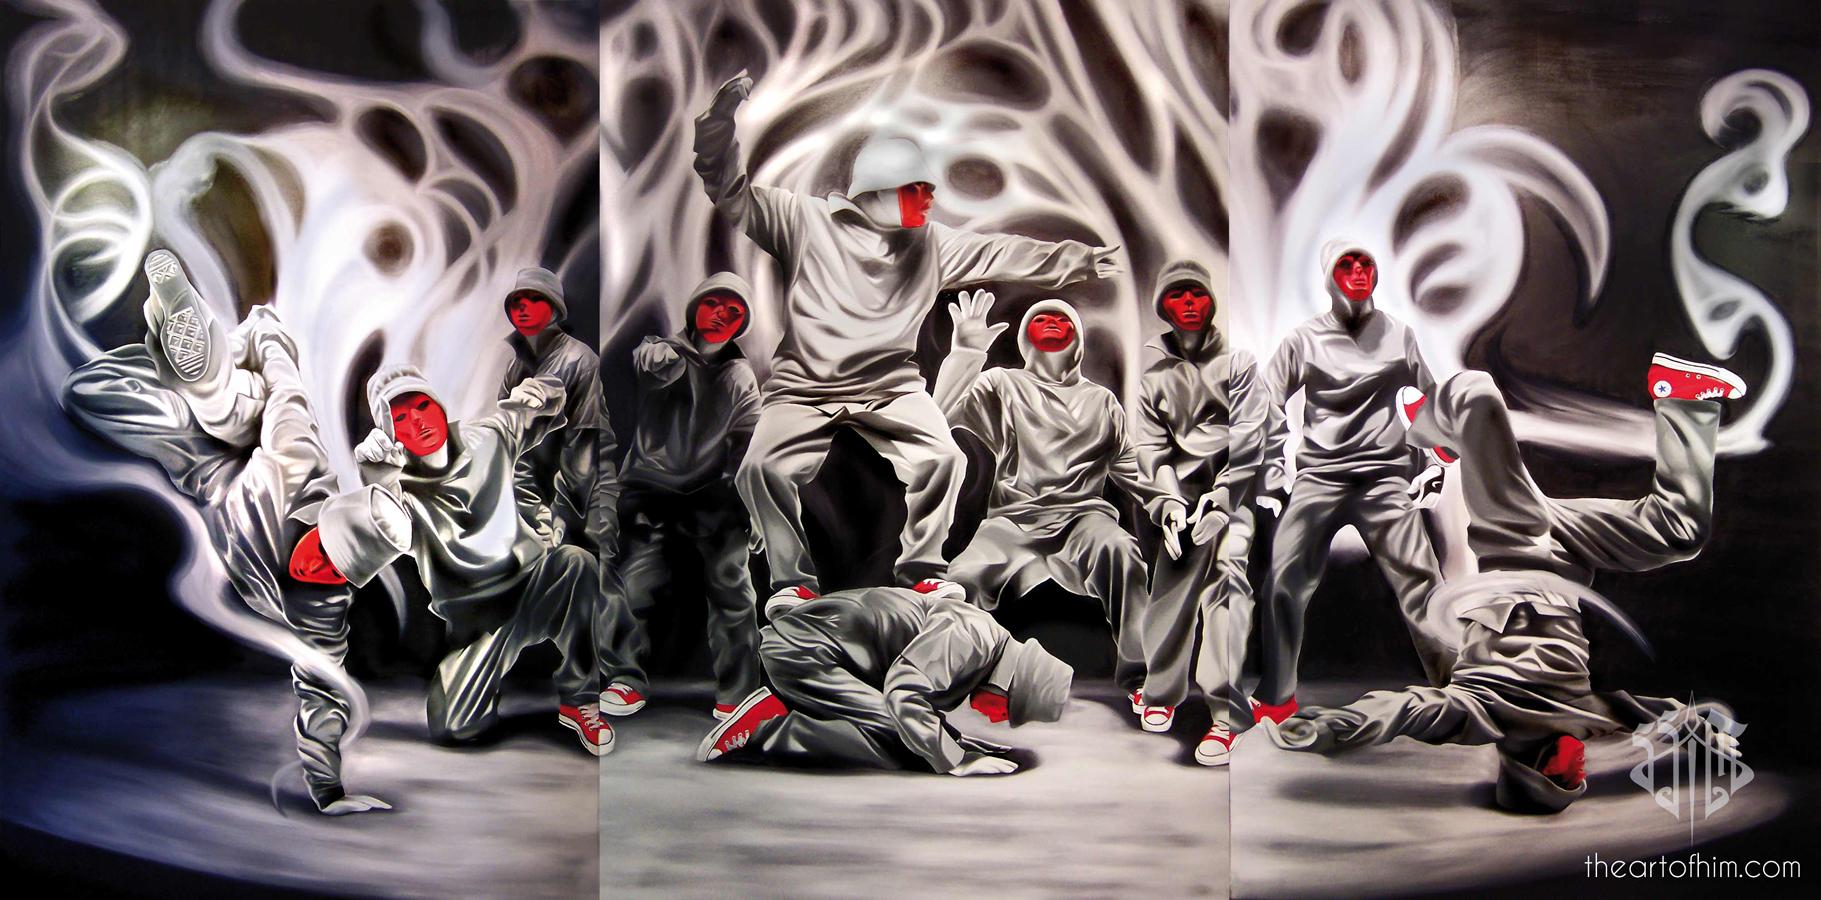 Jabbawockeez Wallpaper - WallpaperSafari